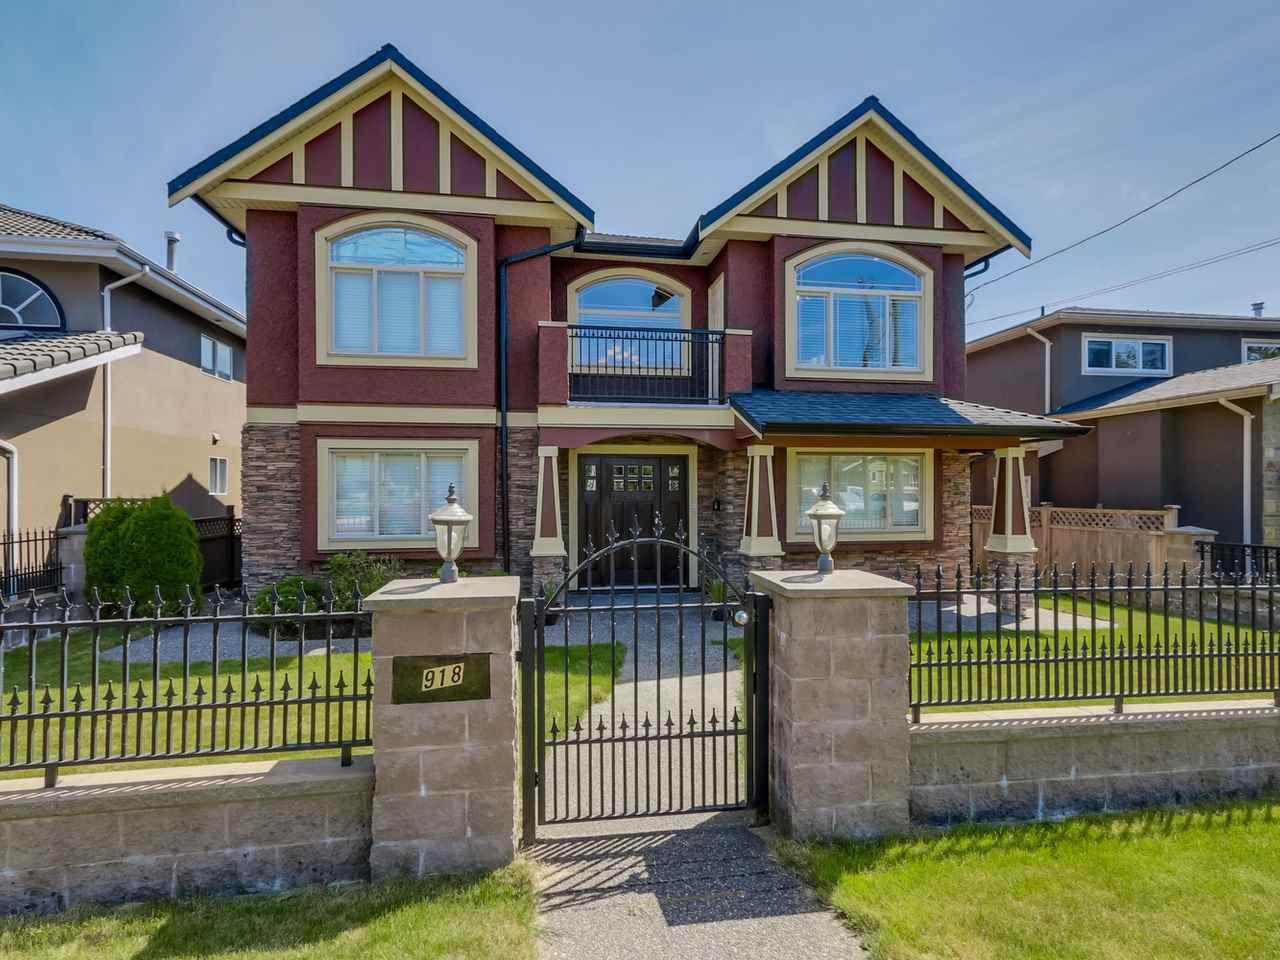 "Main Photo: 918 SPERLING Avenue in Burnaby: Sperling-Duthie House for sale in ""Sperling-Duthie"" (Burnaby North)  : MLS®# R2069619"